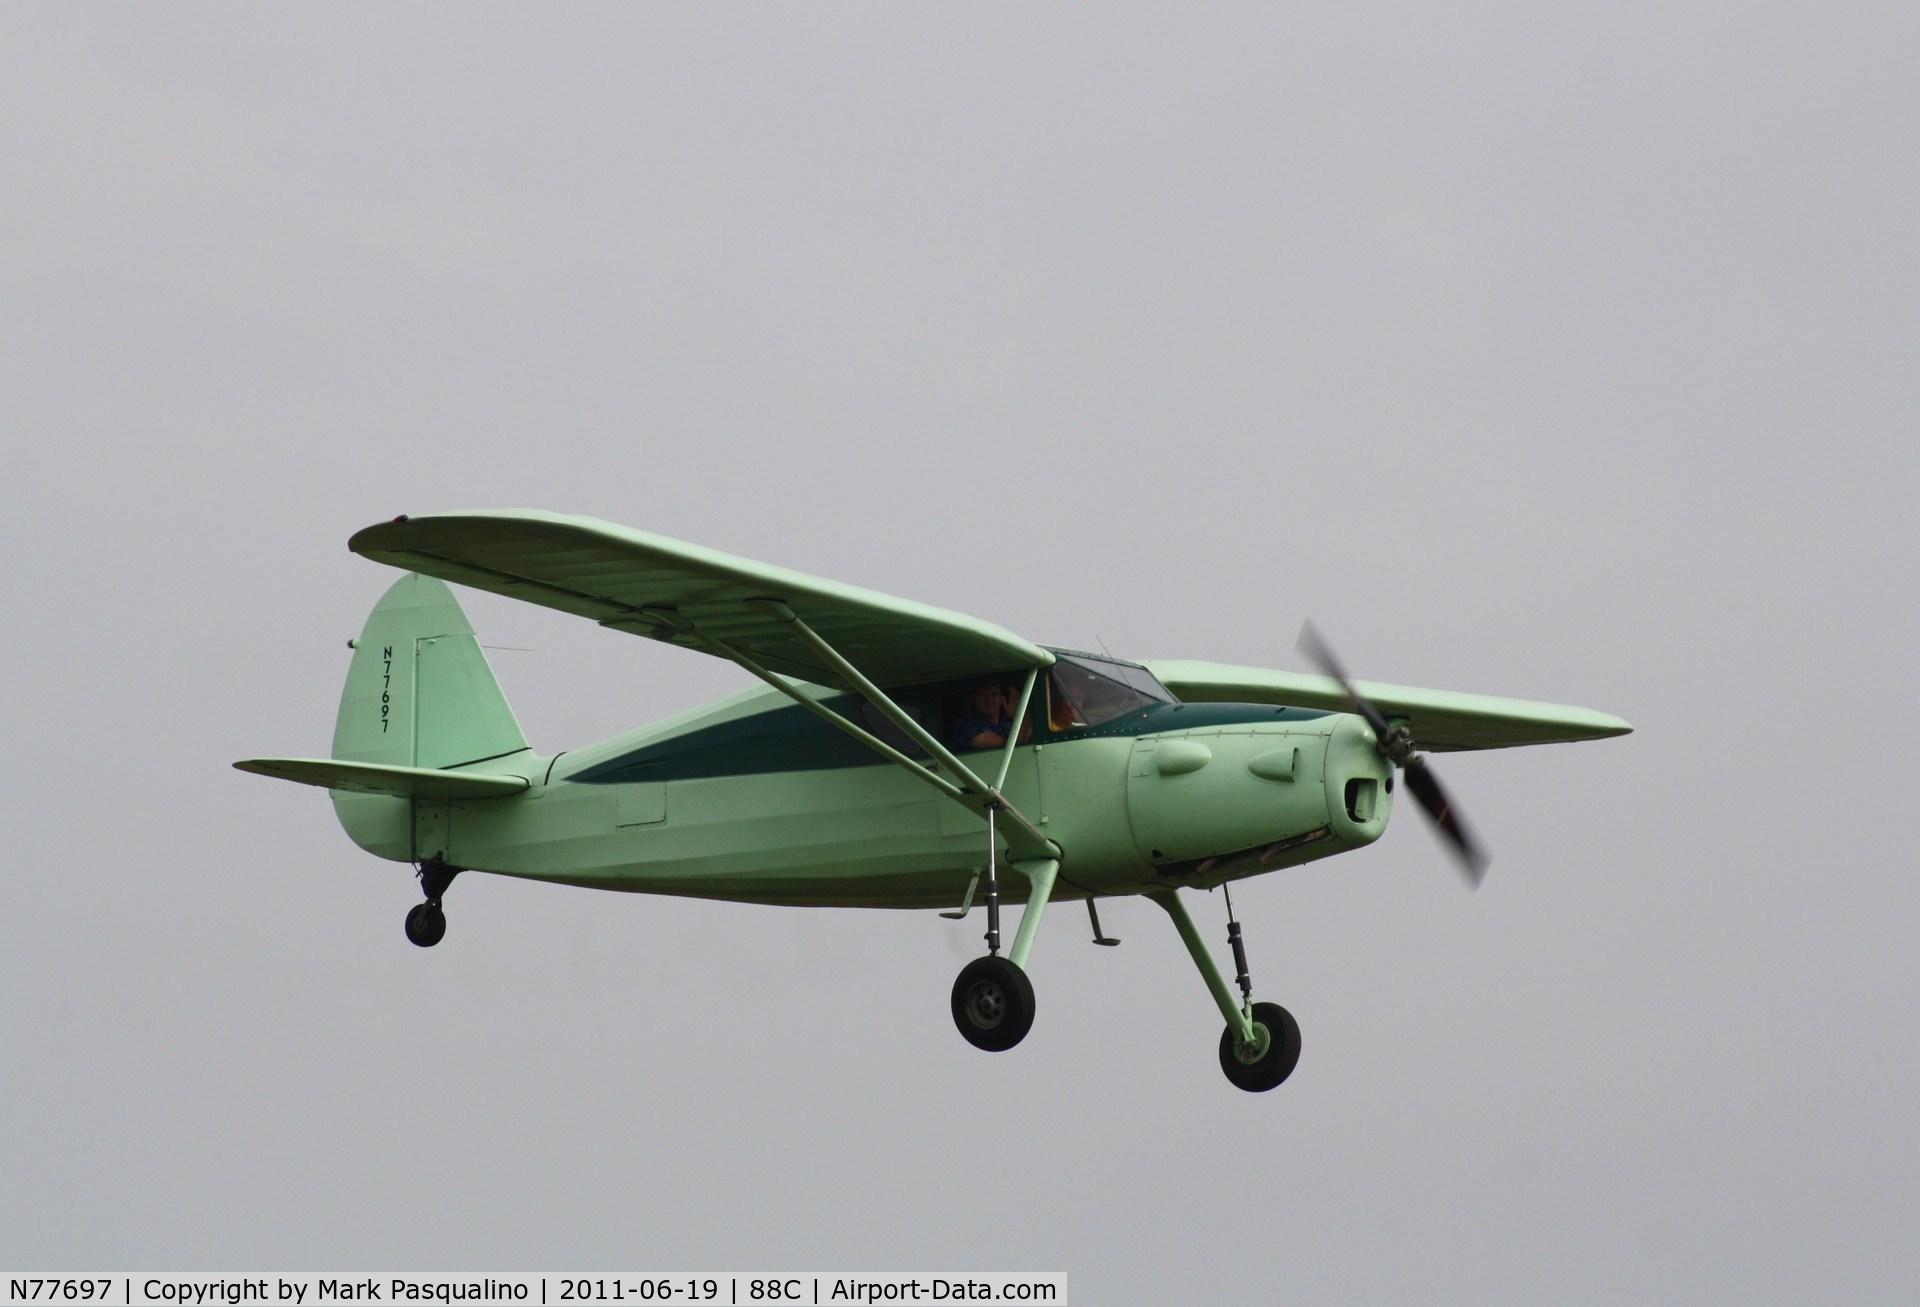 N77697, 1947 Fairchild 24R-46A C/N R46-339, Fairchild 24R-46A